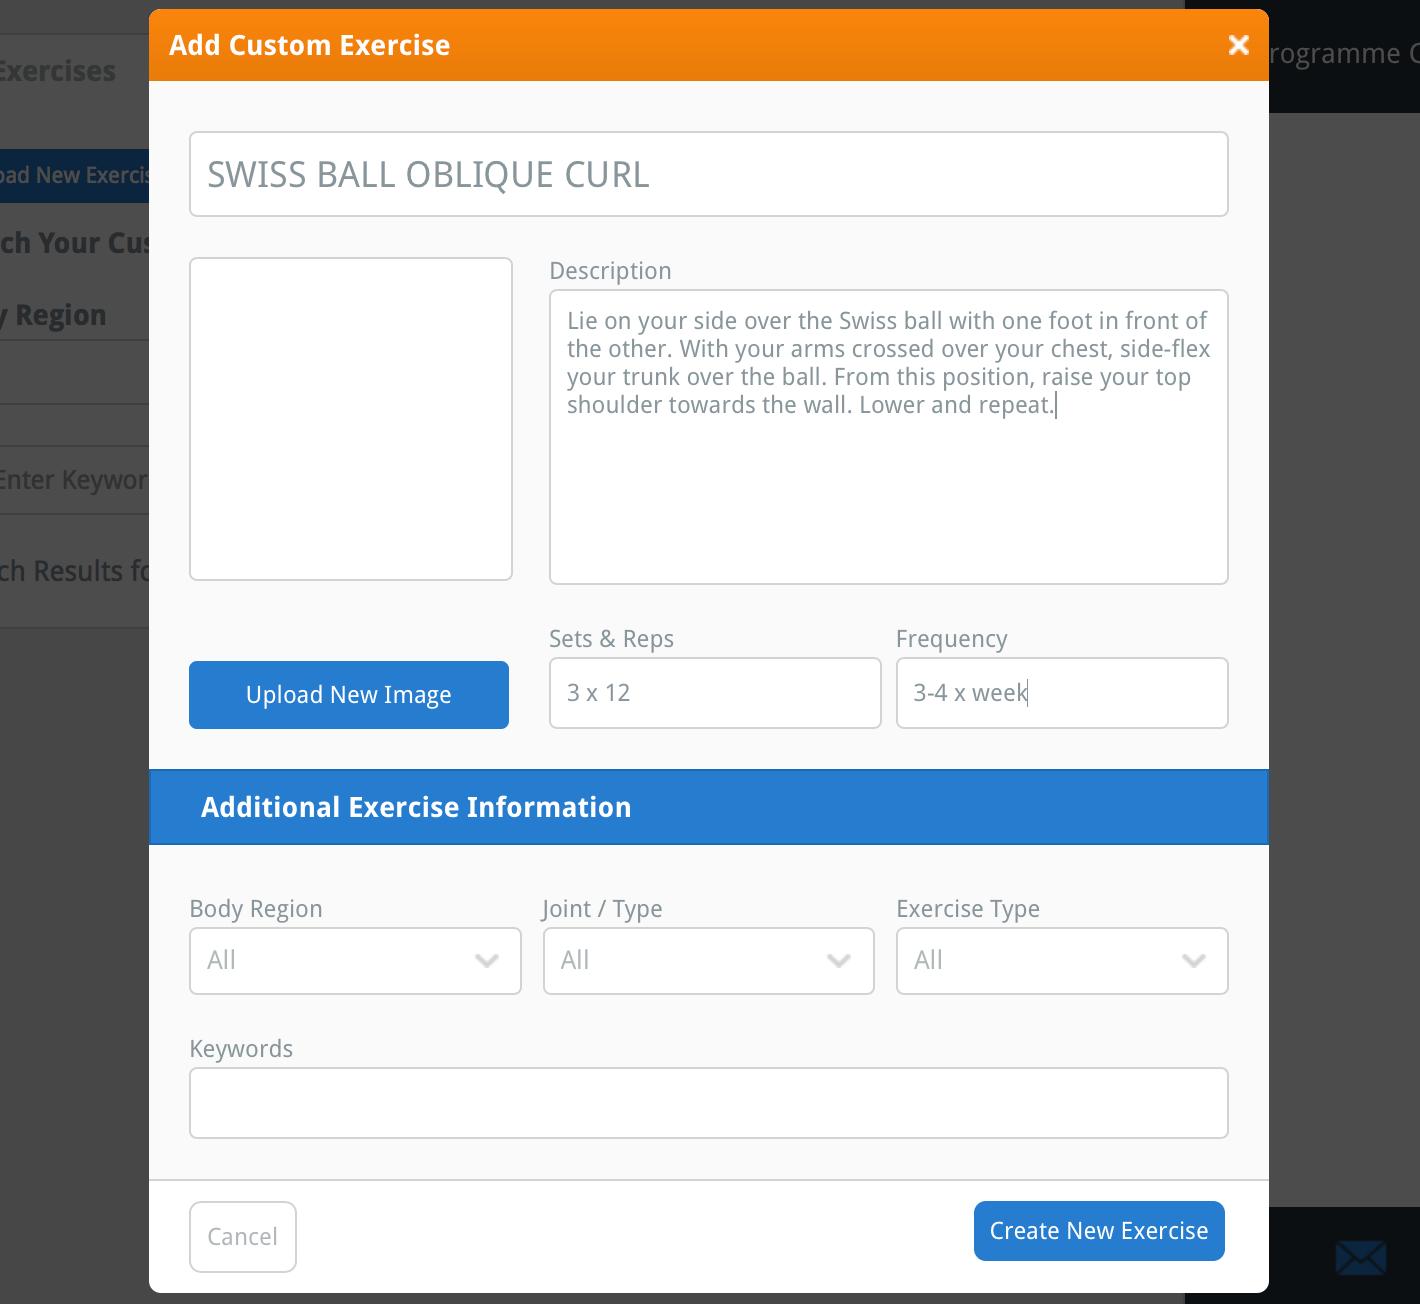 the Add Custom Exercise window